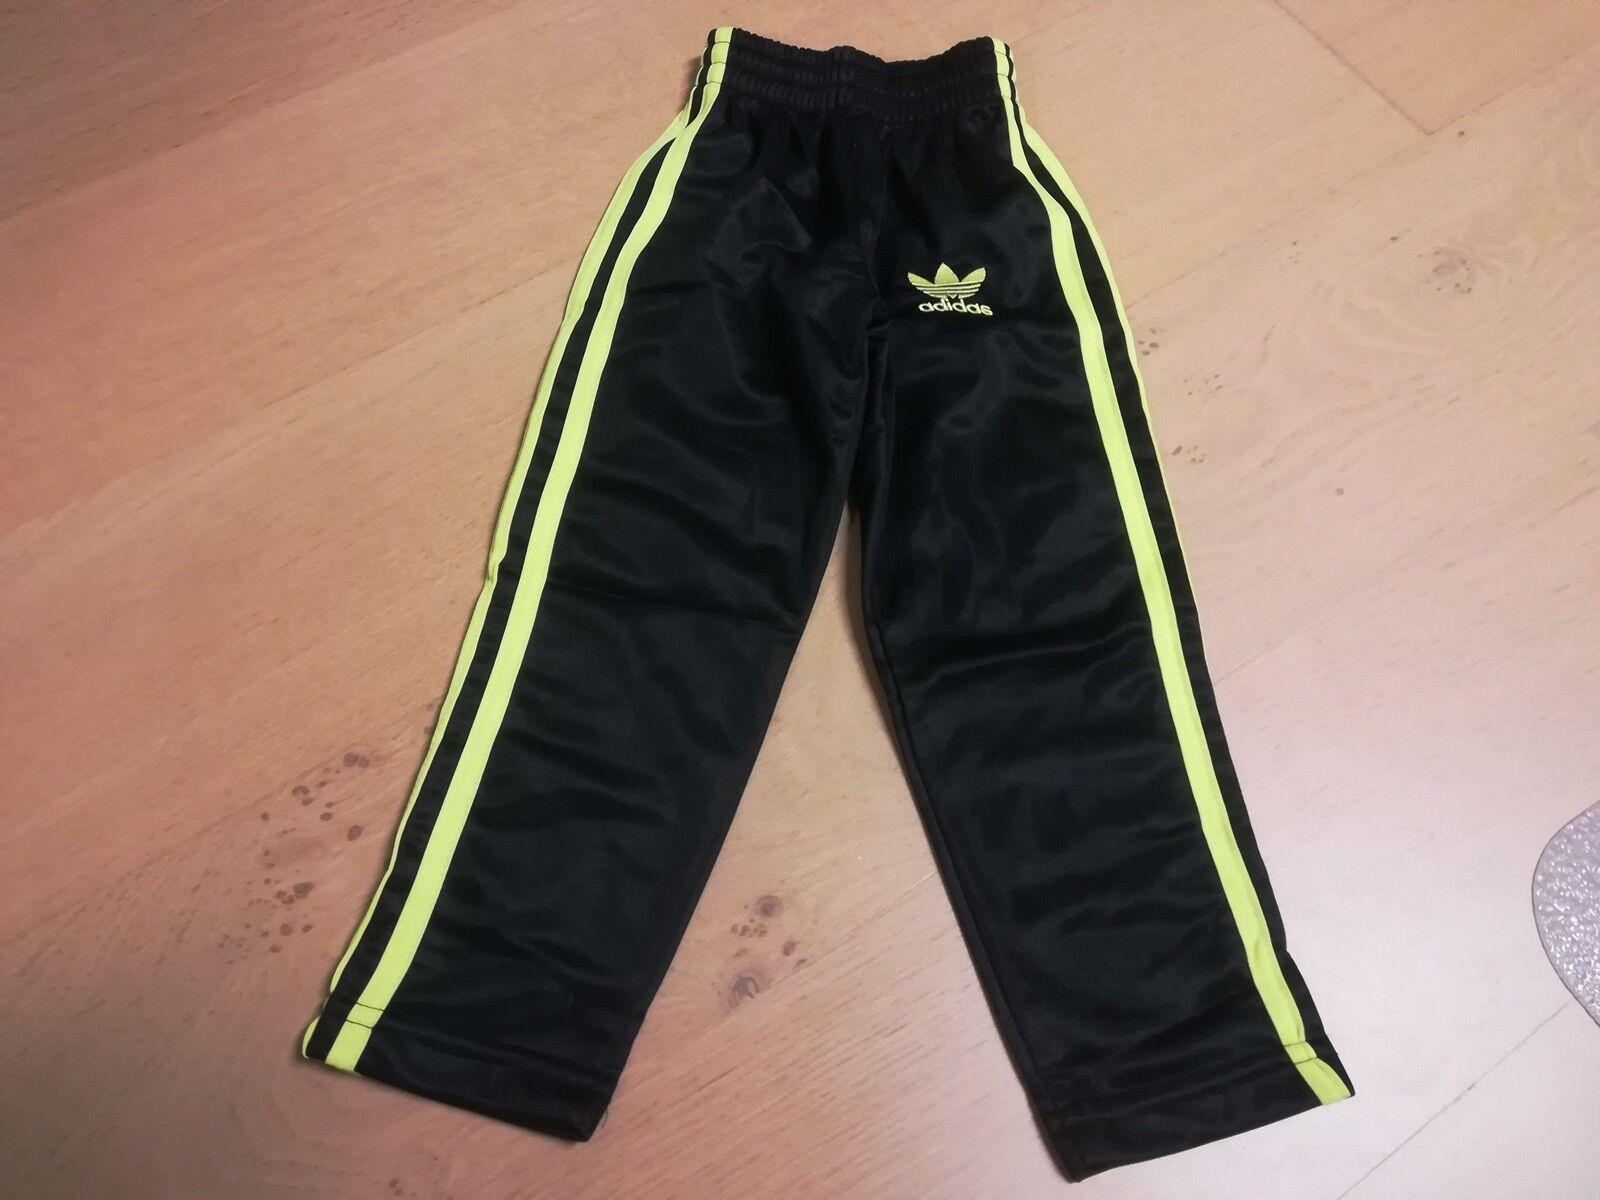 Bukser, Træningsbukser, Adidas